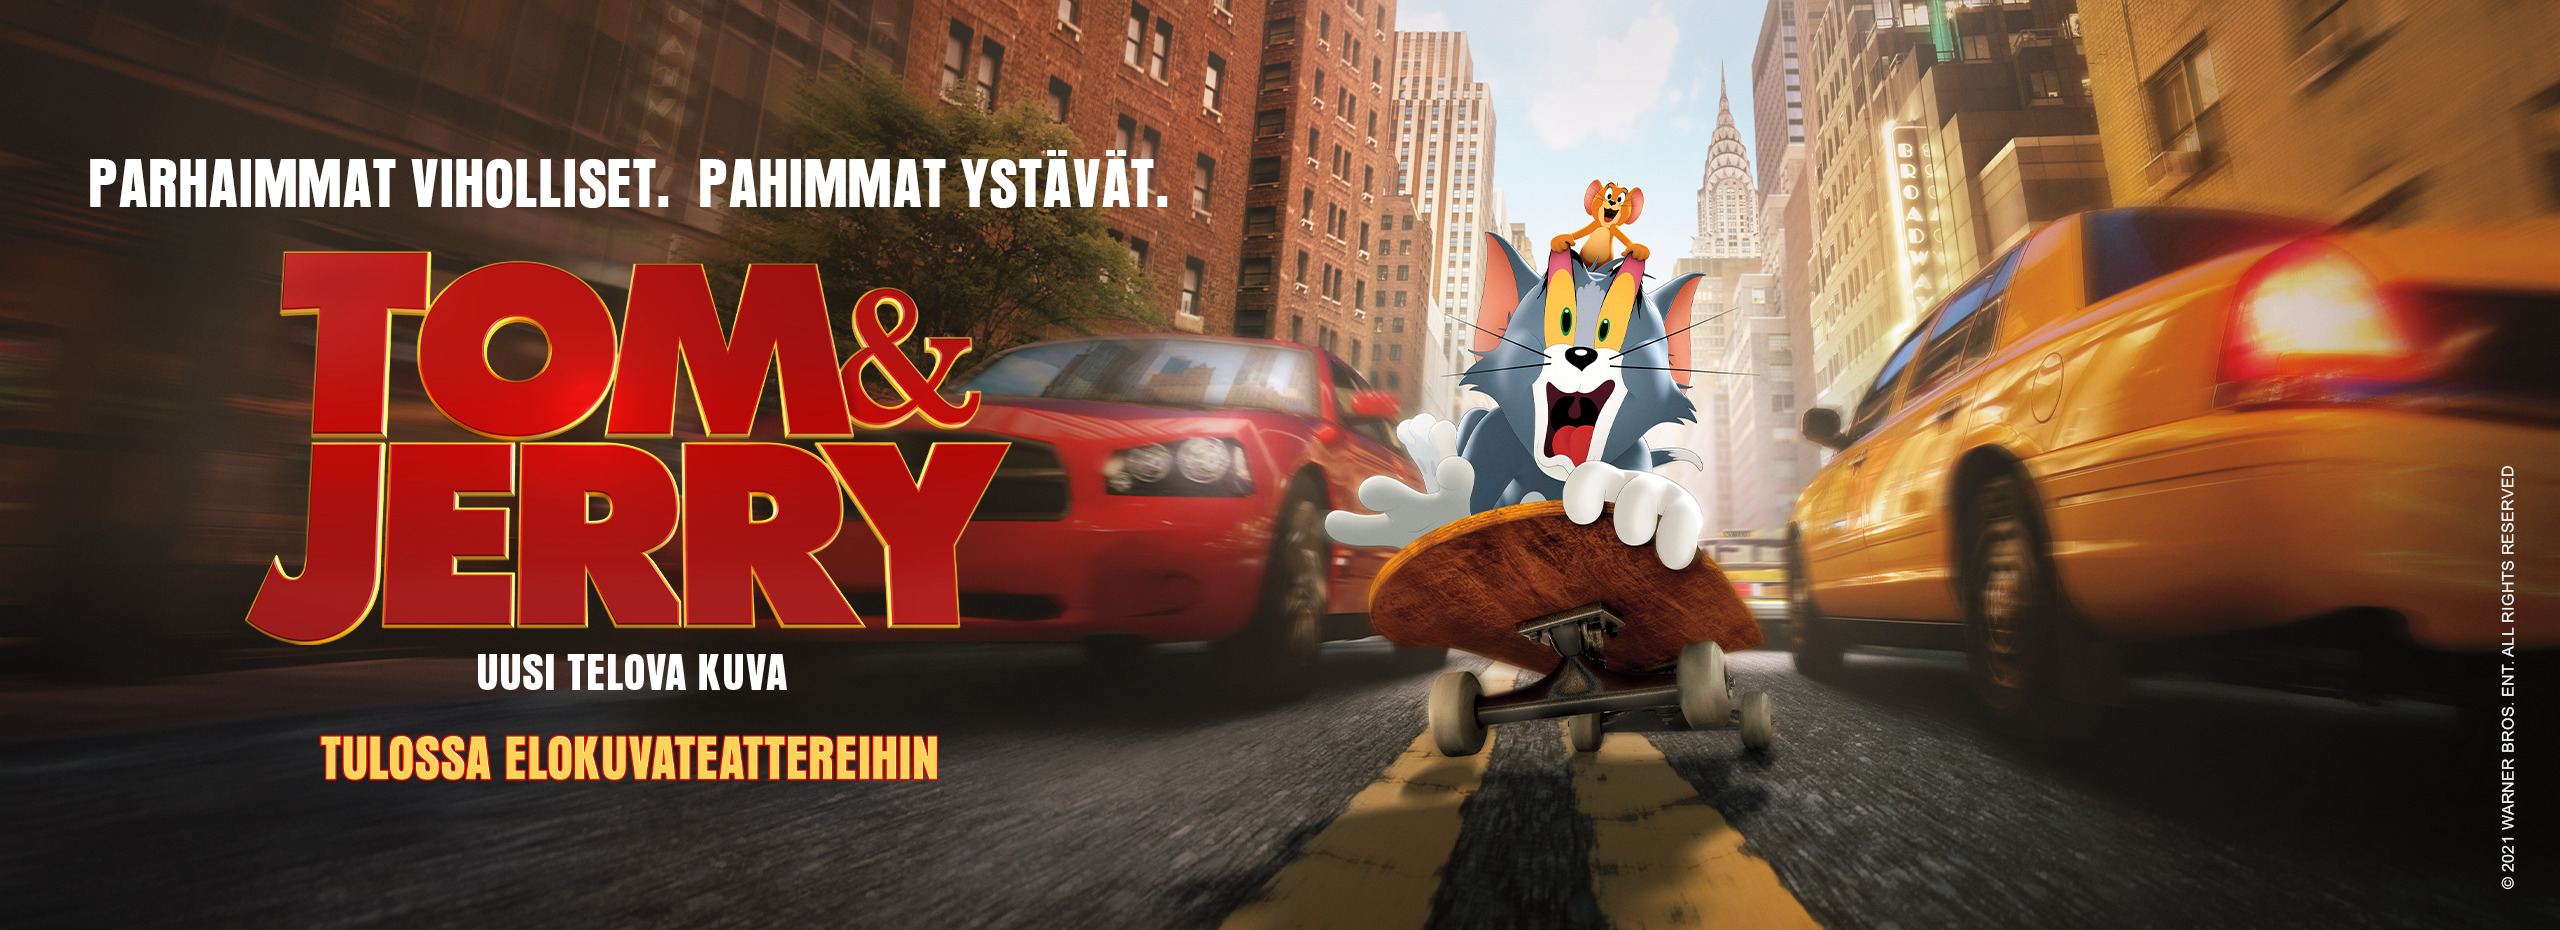 Xplora goplay alustassa nyt Tom & Jerry kampanja